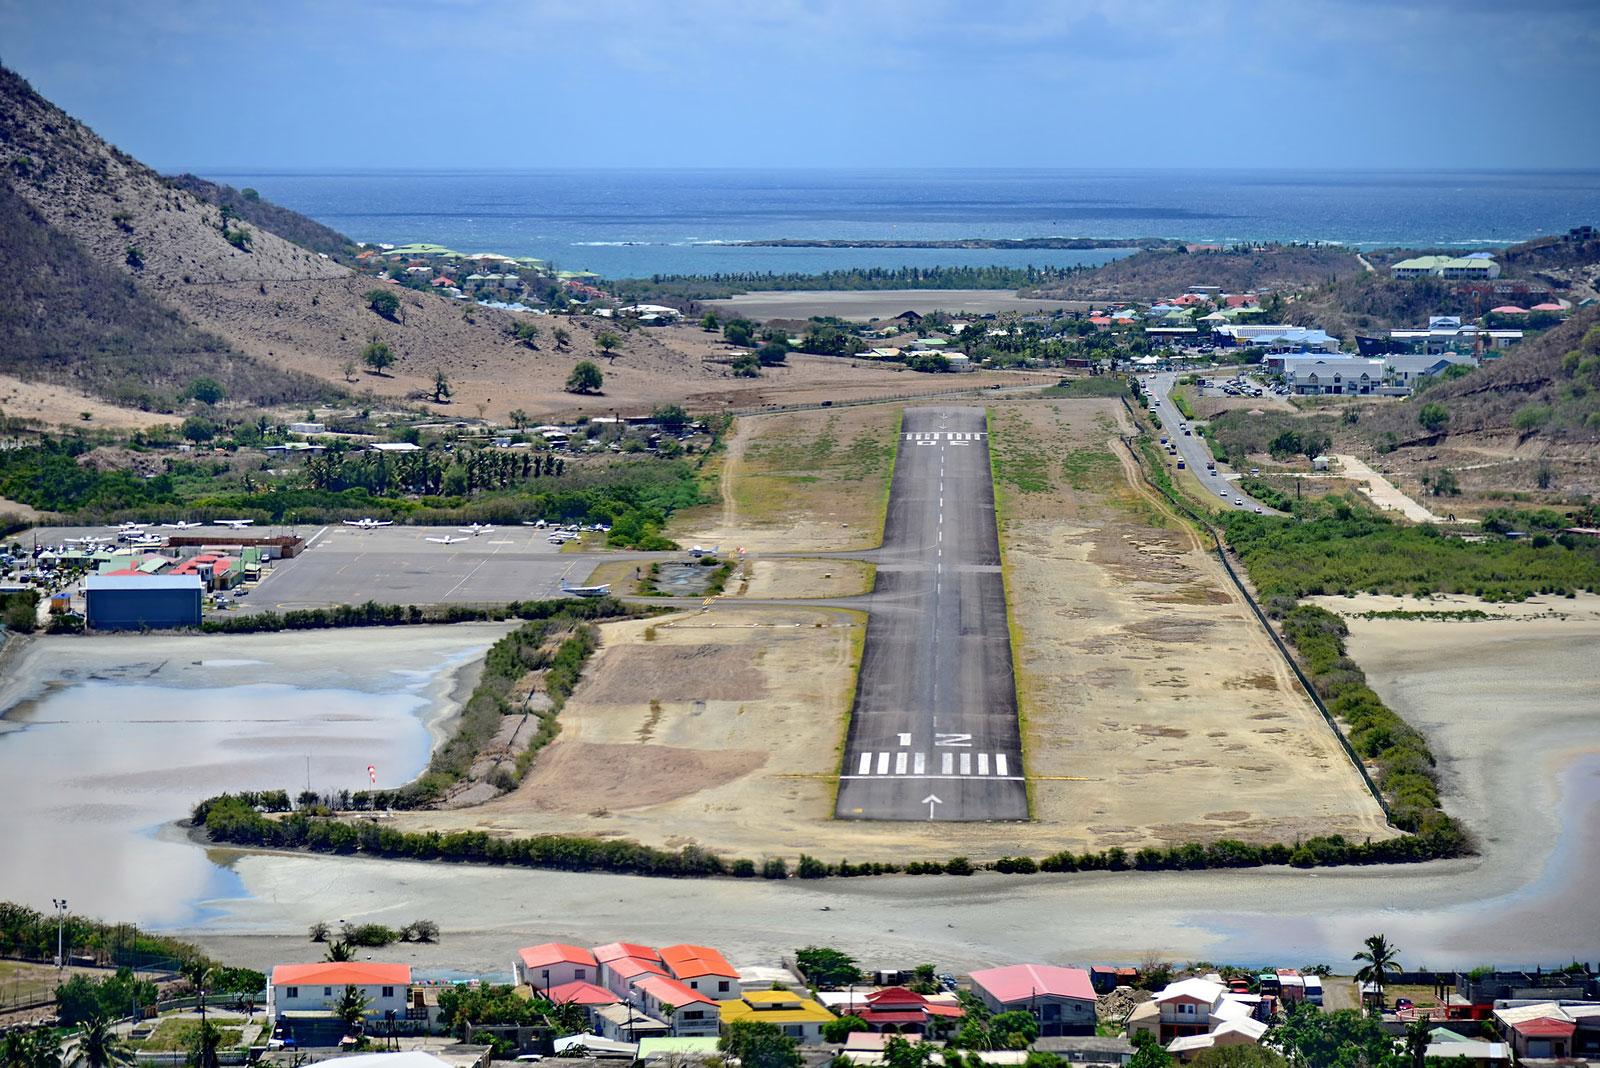 The landingstrip at L'Esperance Airport at Grand Case, Saint Martin.